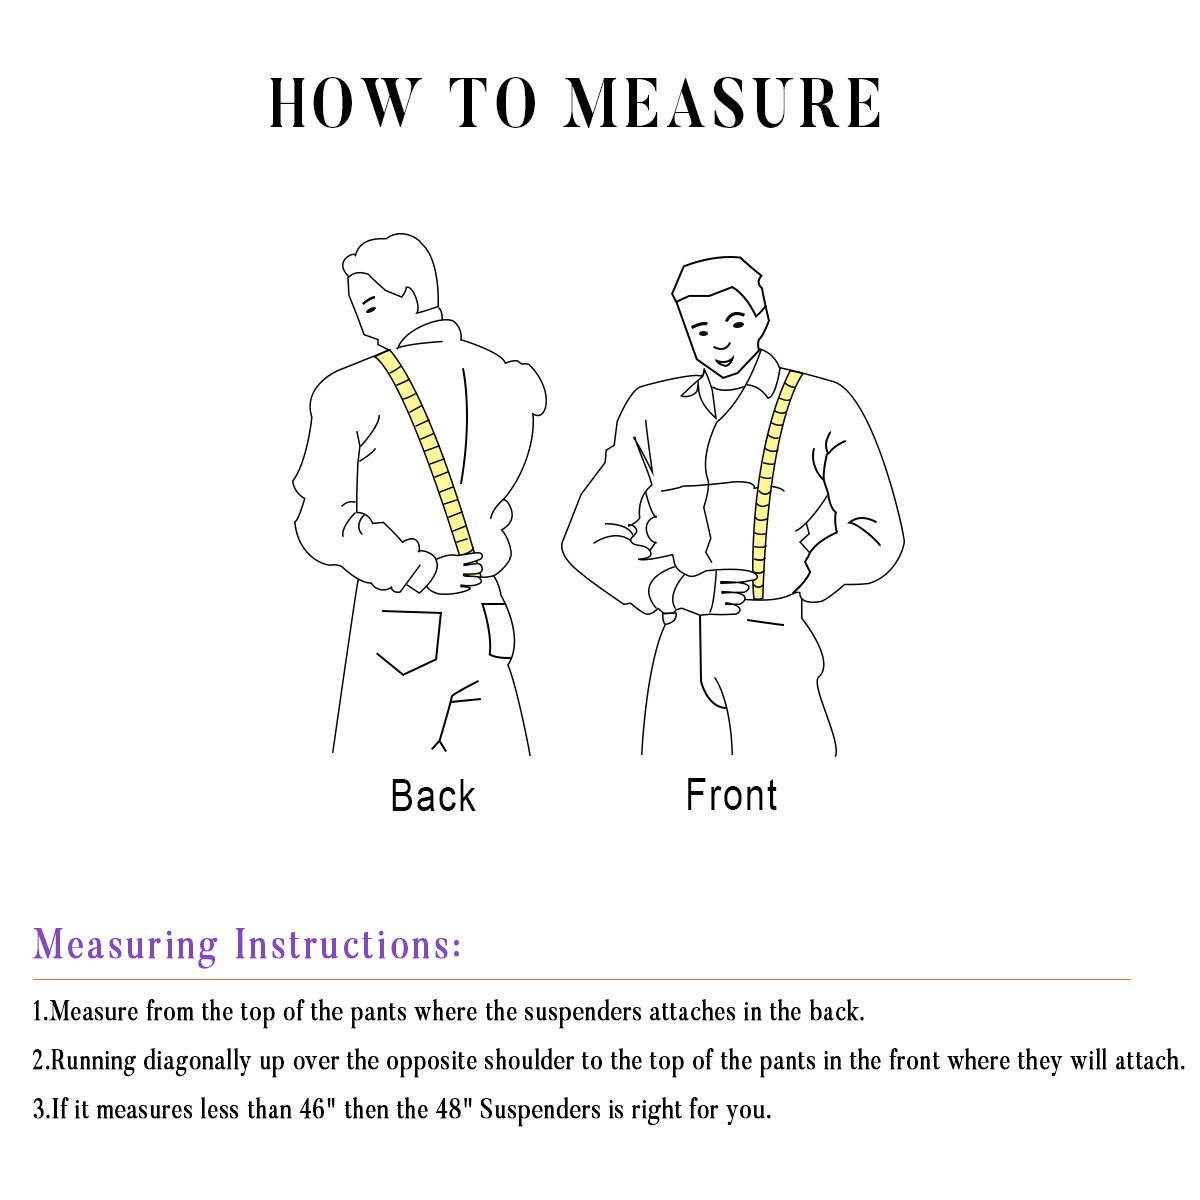 Mens X-Back Heavy Duty Work Suspenders 2'' Wide Adjustable Elastic Clip Suspenders 2pc(Black/Striped) by GradeCode (Image #6)